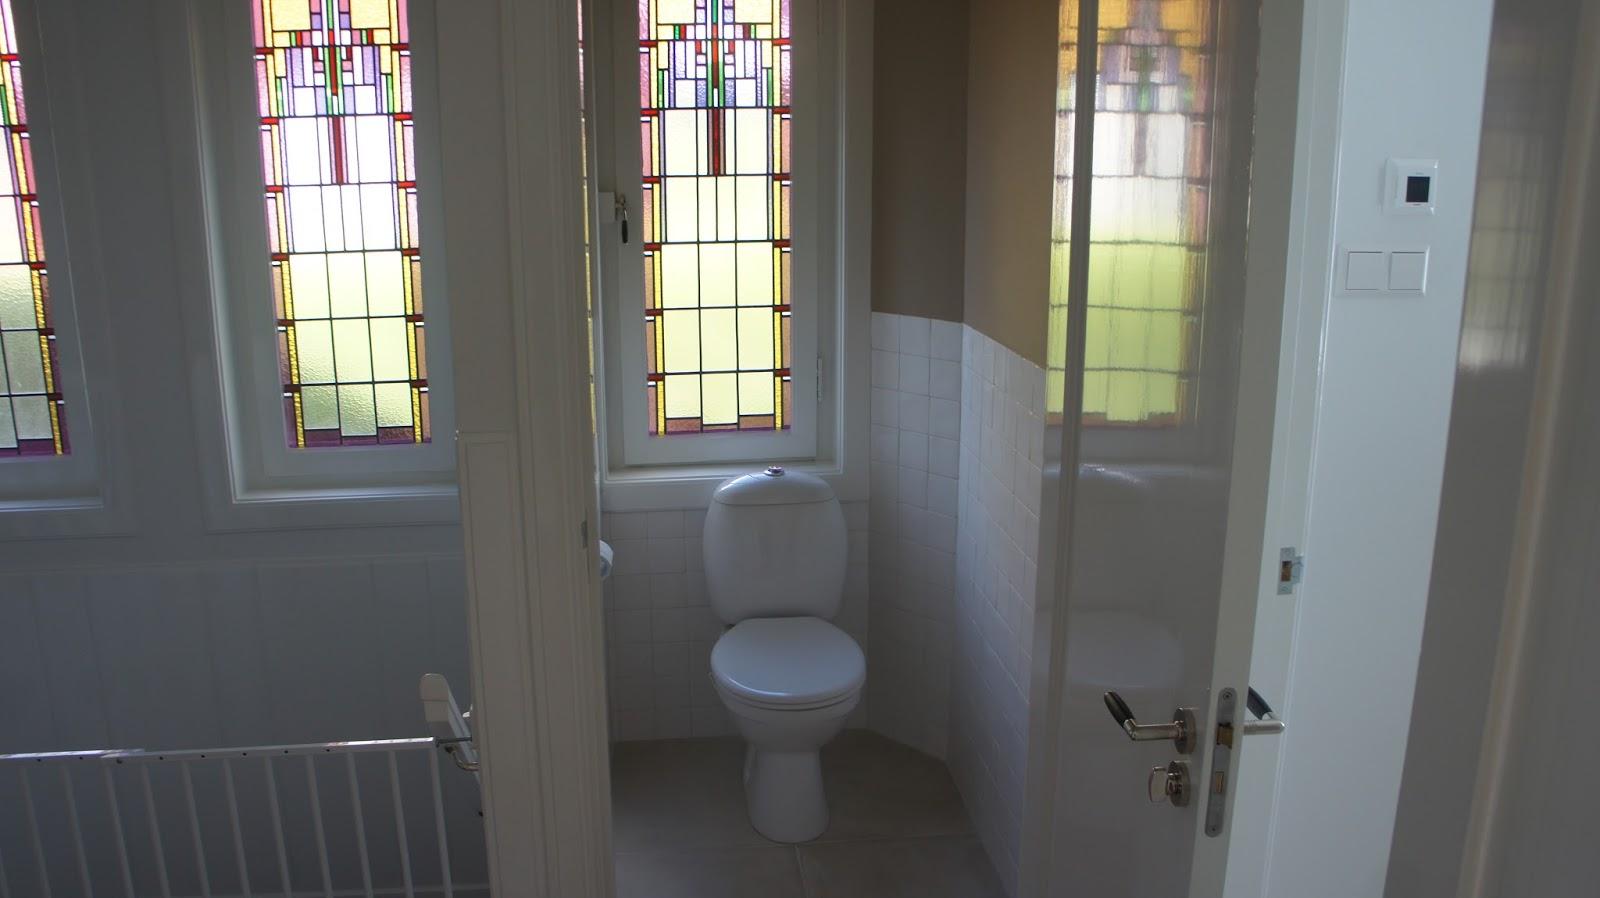 Multifunctionele badkamer in kleine ruimte blog startpagina voor badkamer idee n uw - Wc kleine ruimte ...